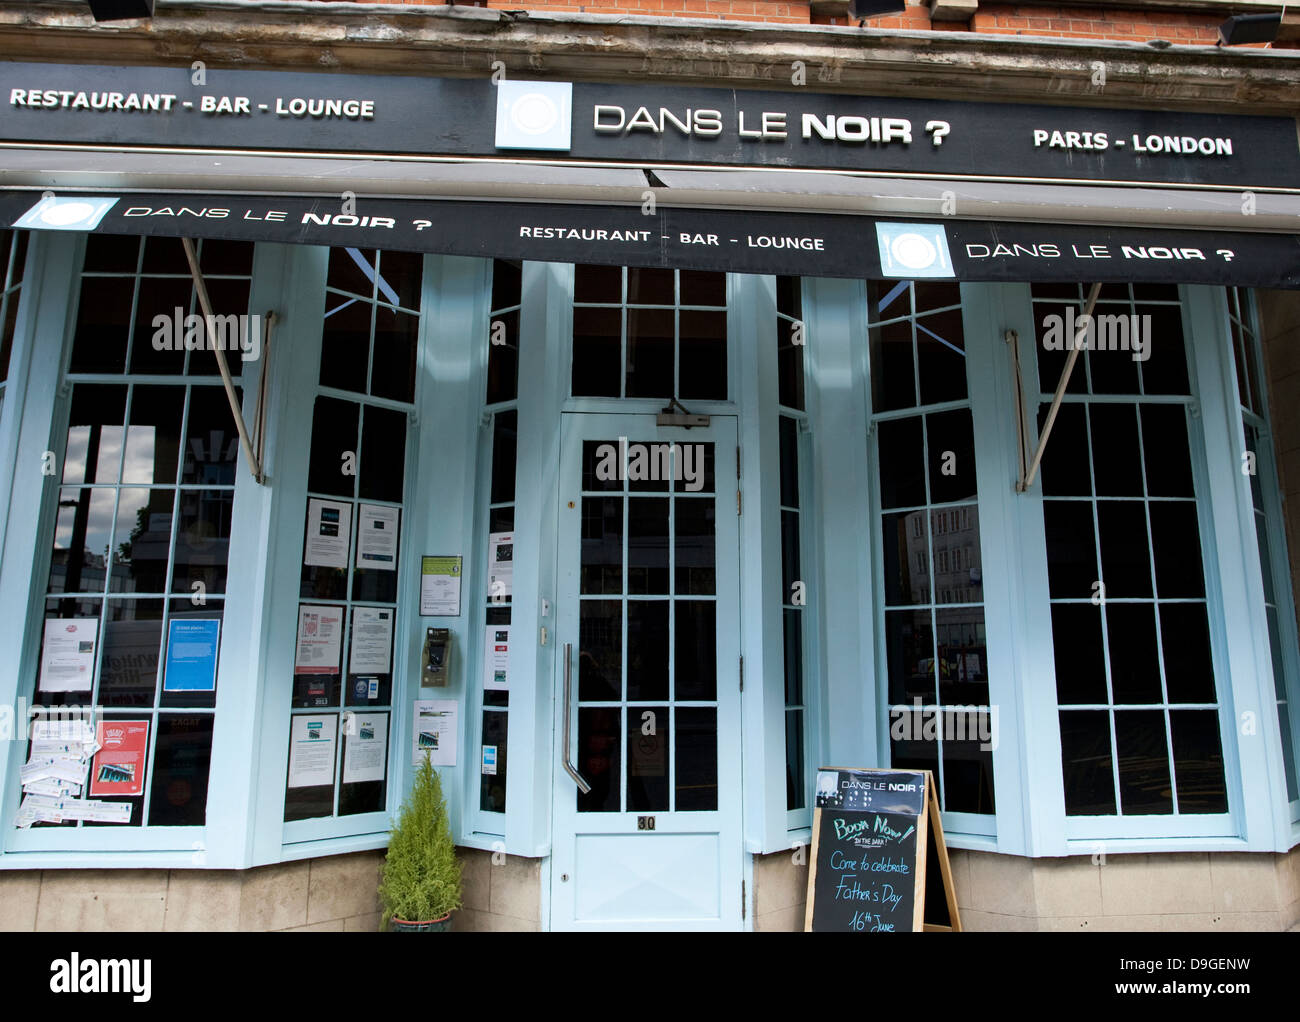 Clerkenwell London Restaurant Stock Photos & Clerkenwell London ...